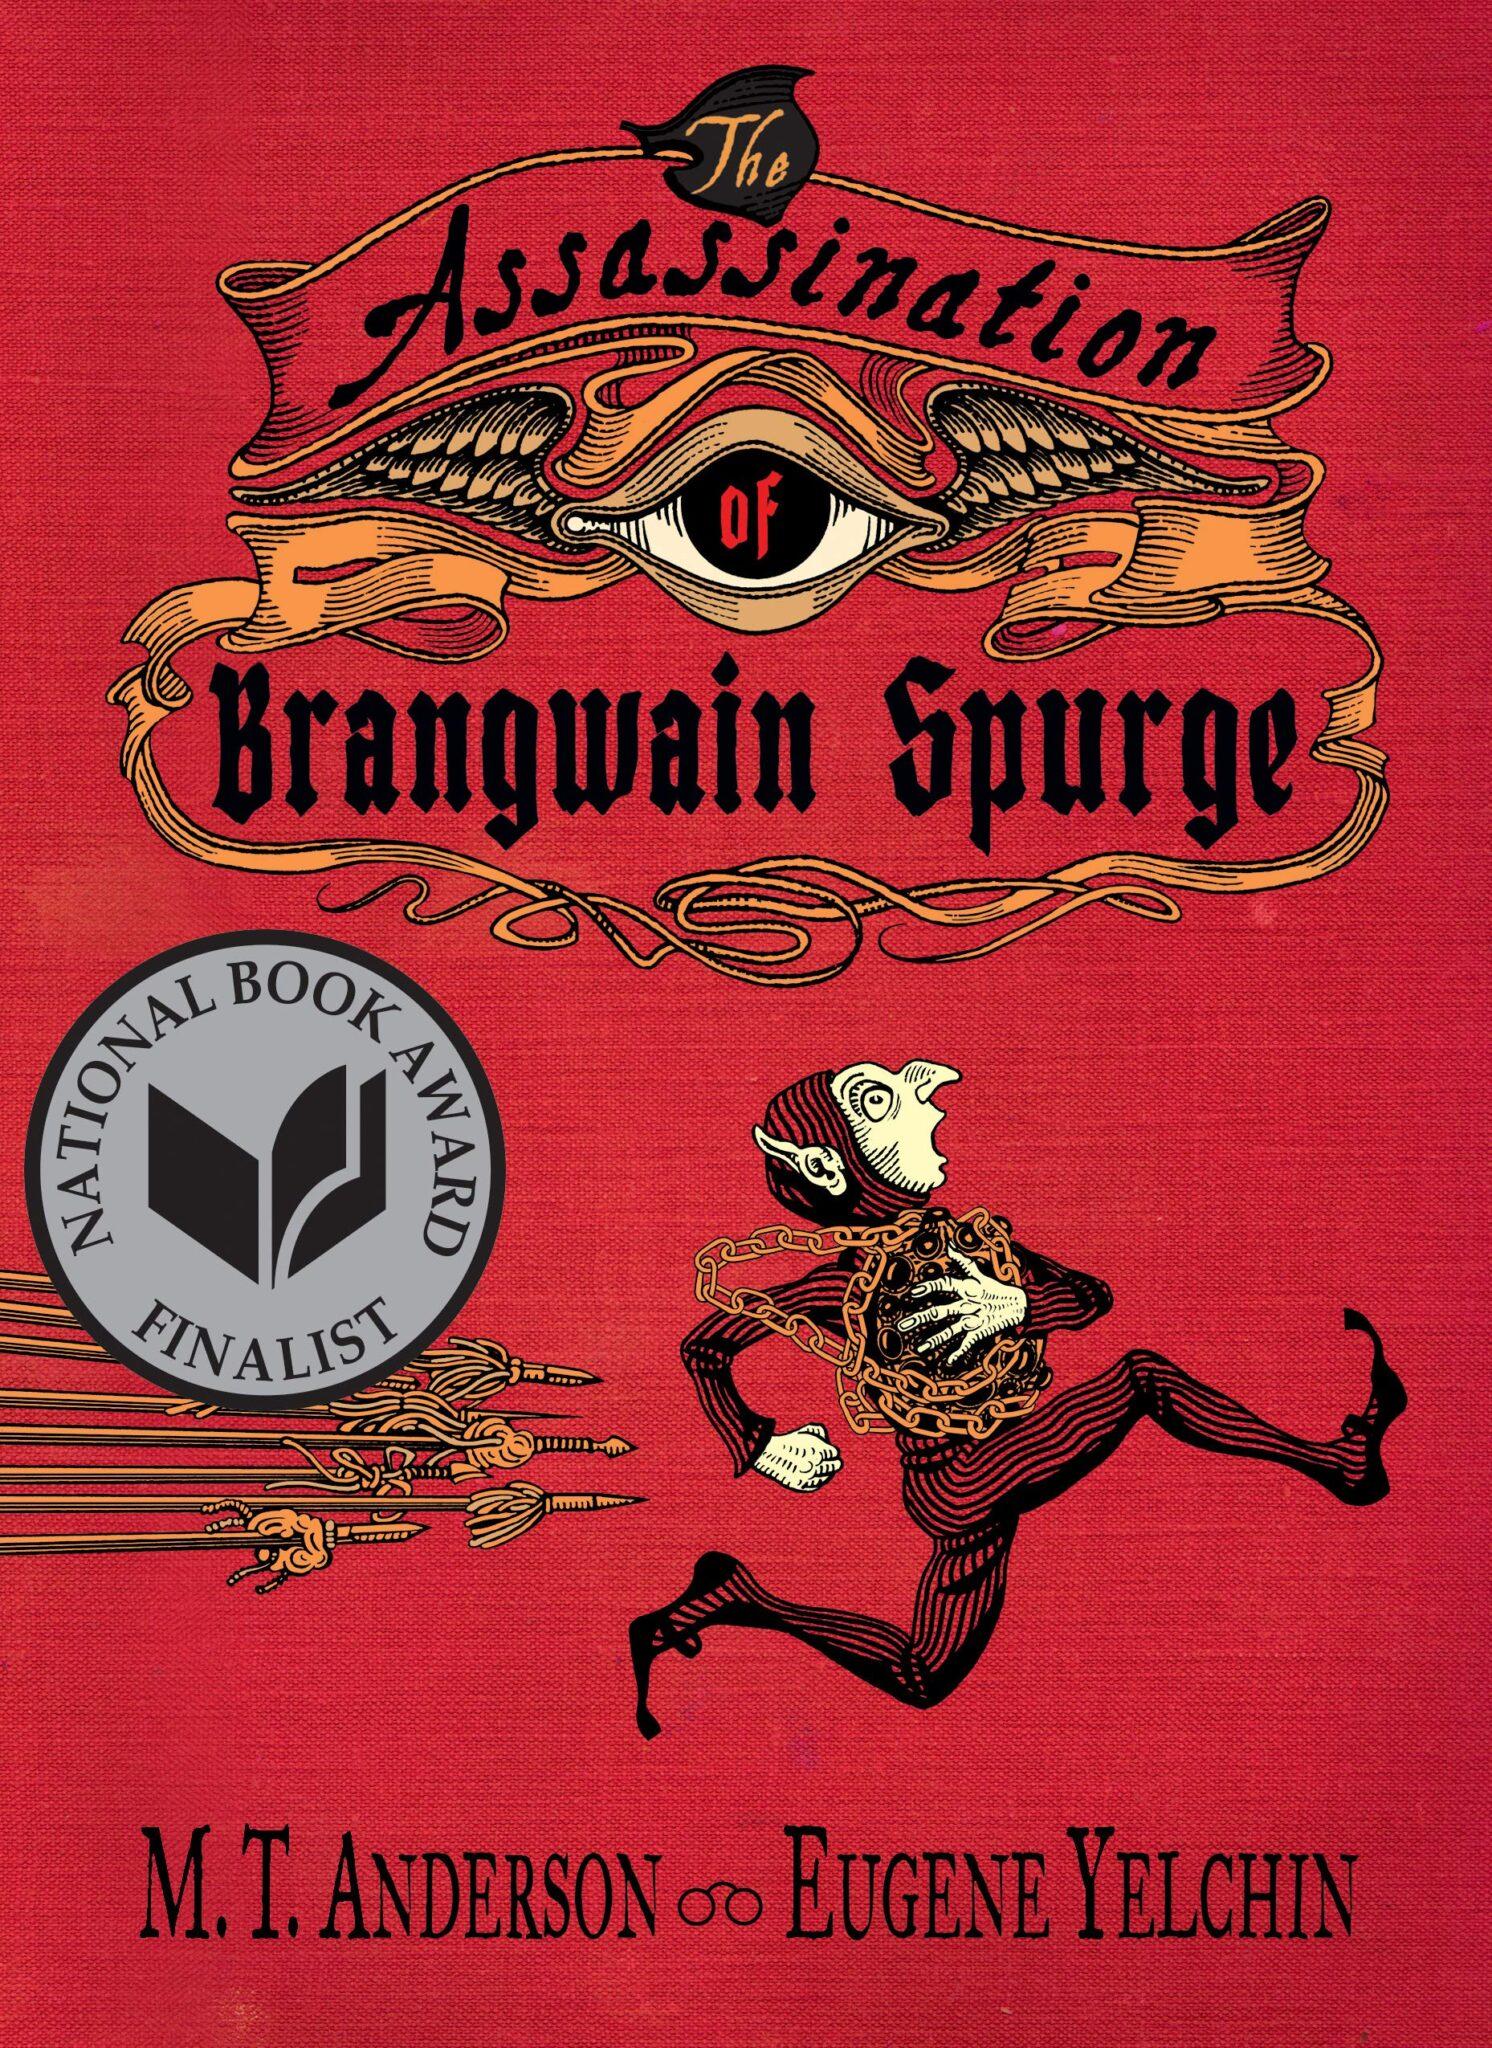 assassination of brangwain spurge cover